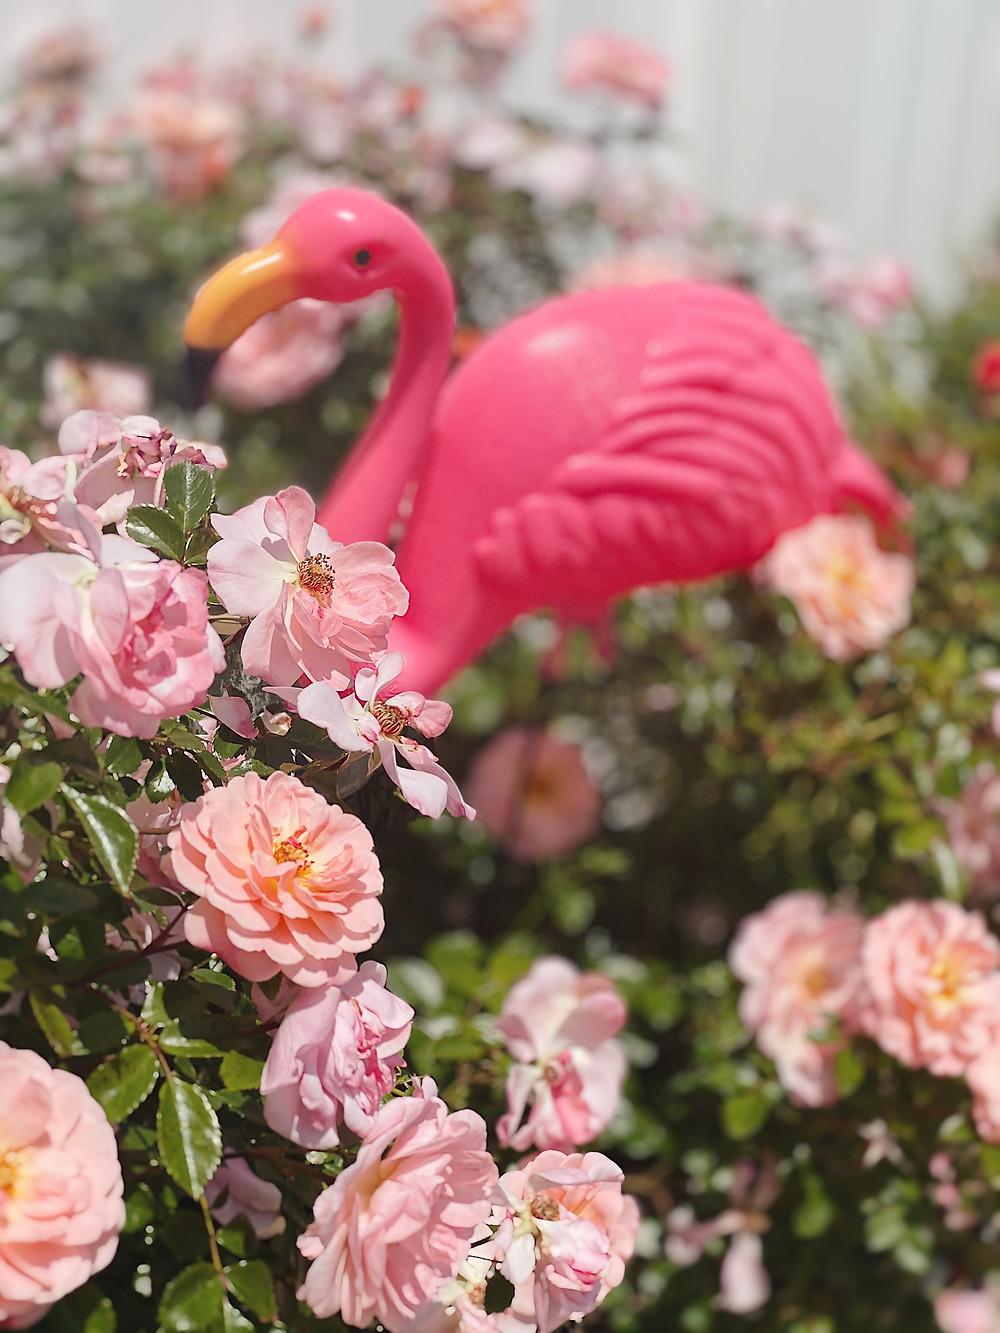 Flamingo Yard Ornament from Amazon